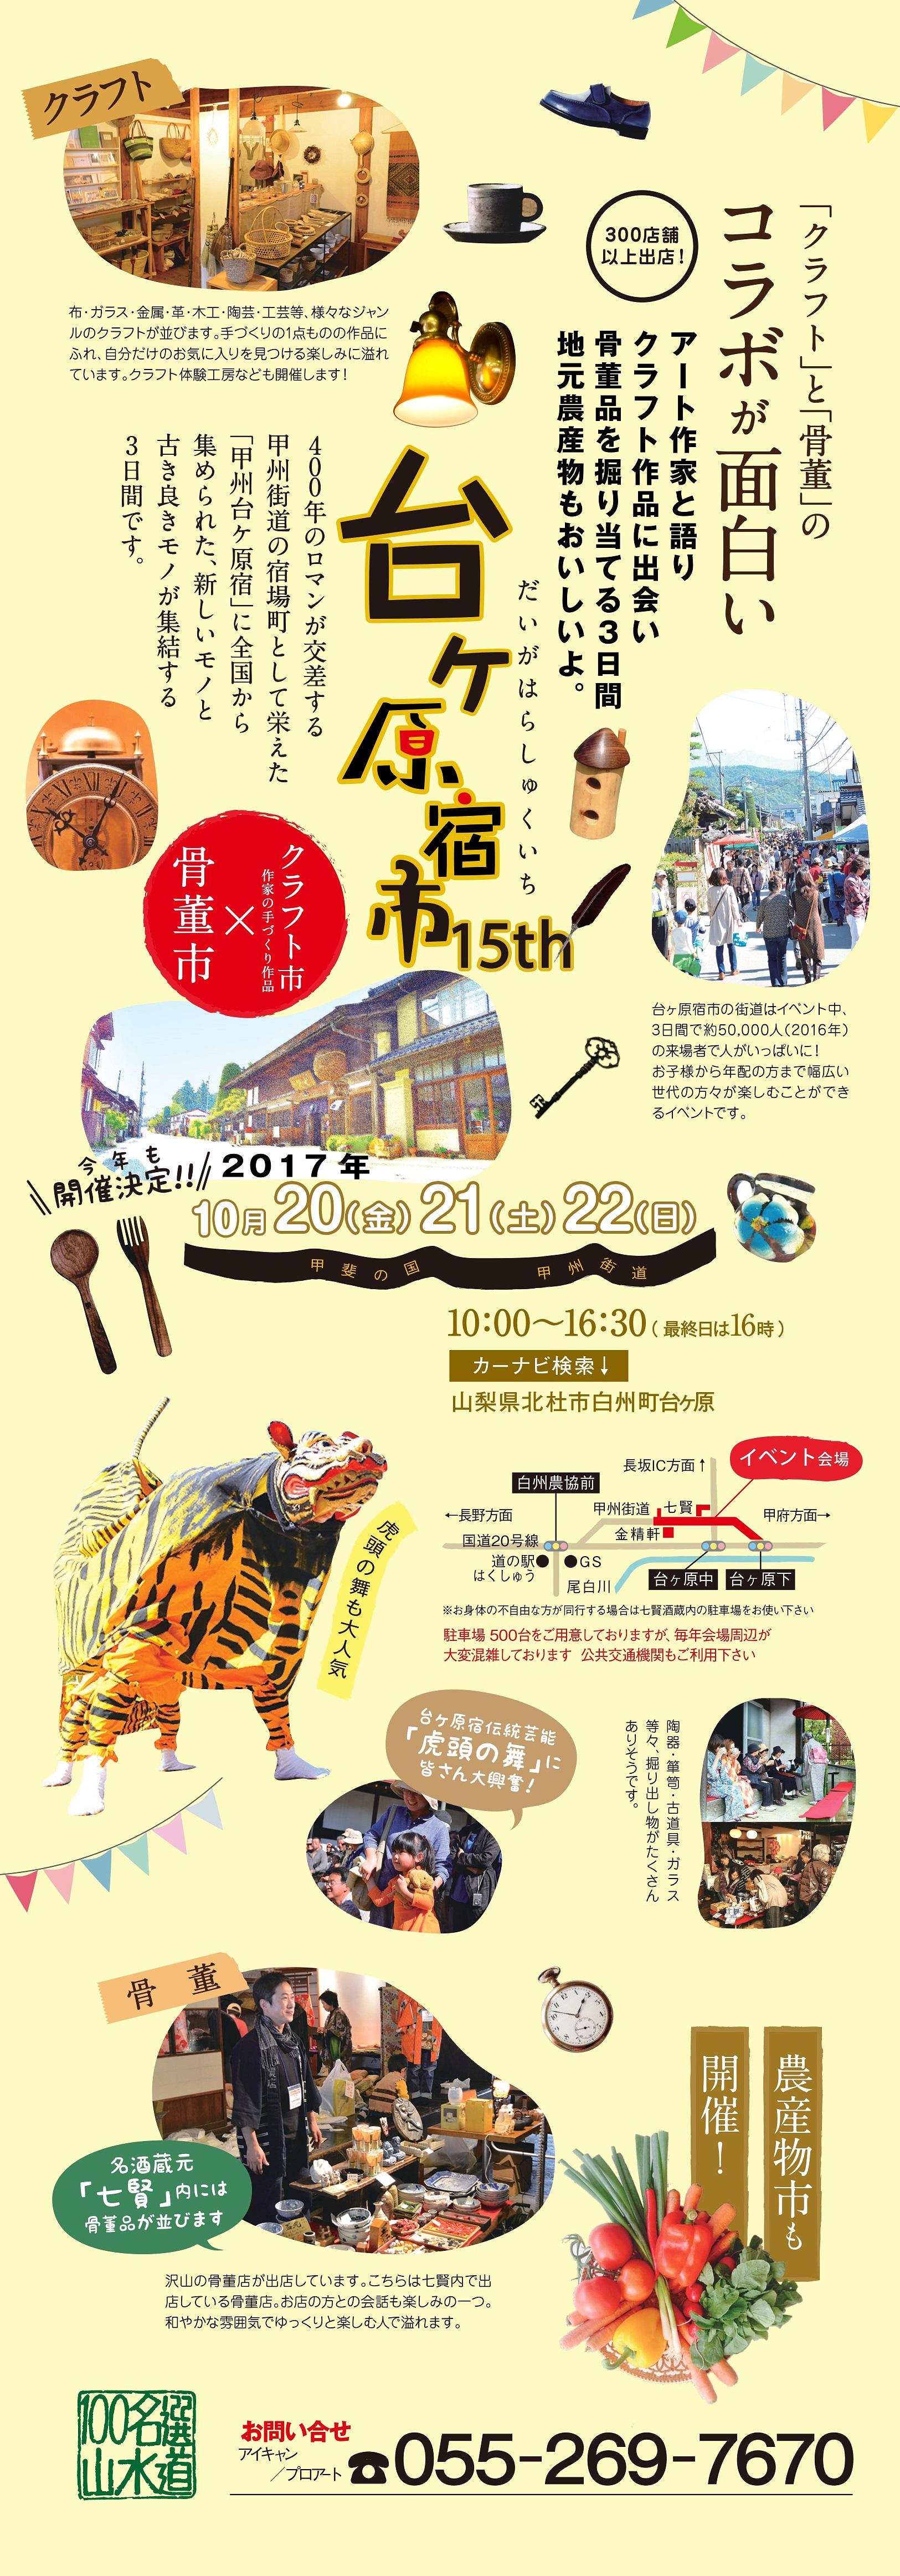 daigahara2